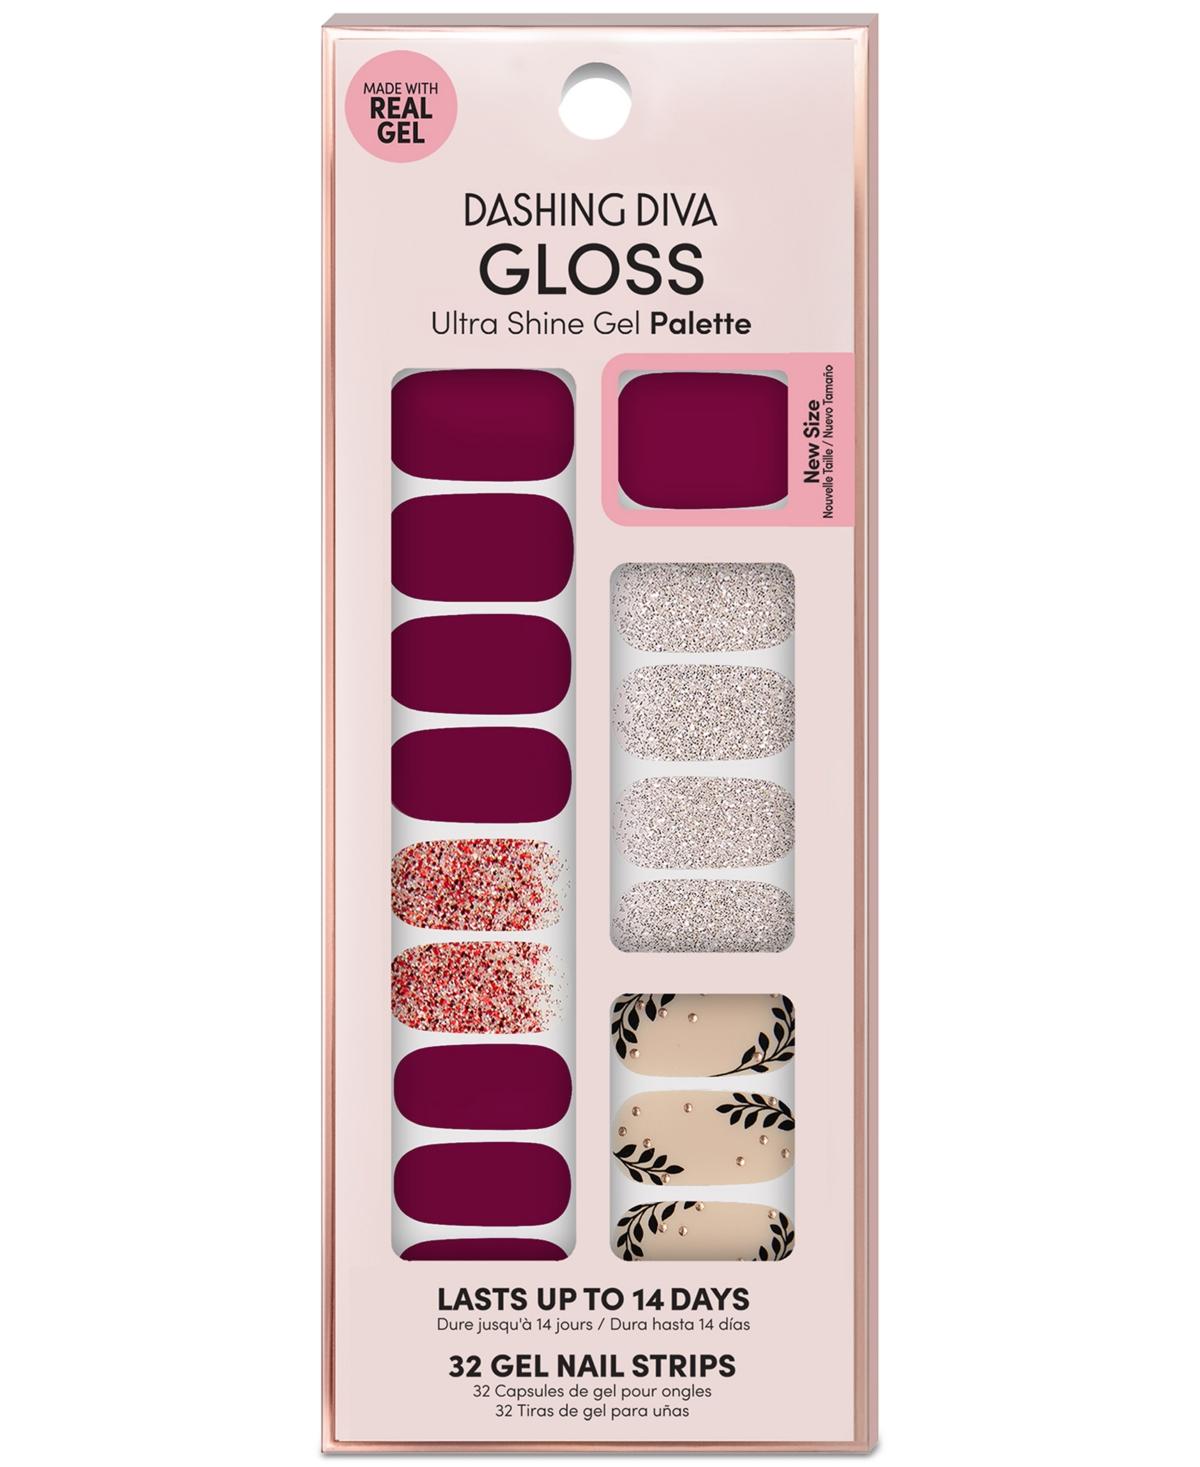 Dashing Diva Gloss Ultra Shine Gel Palette - Bordeaux Beauty